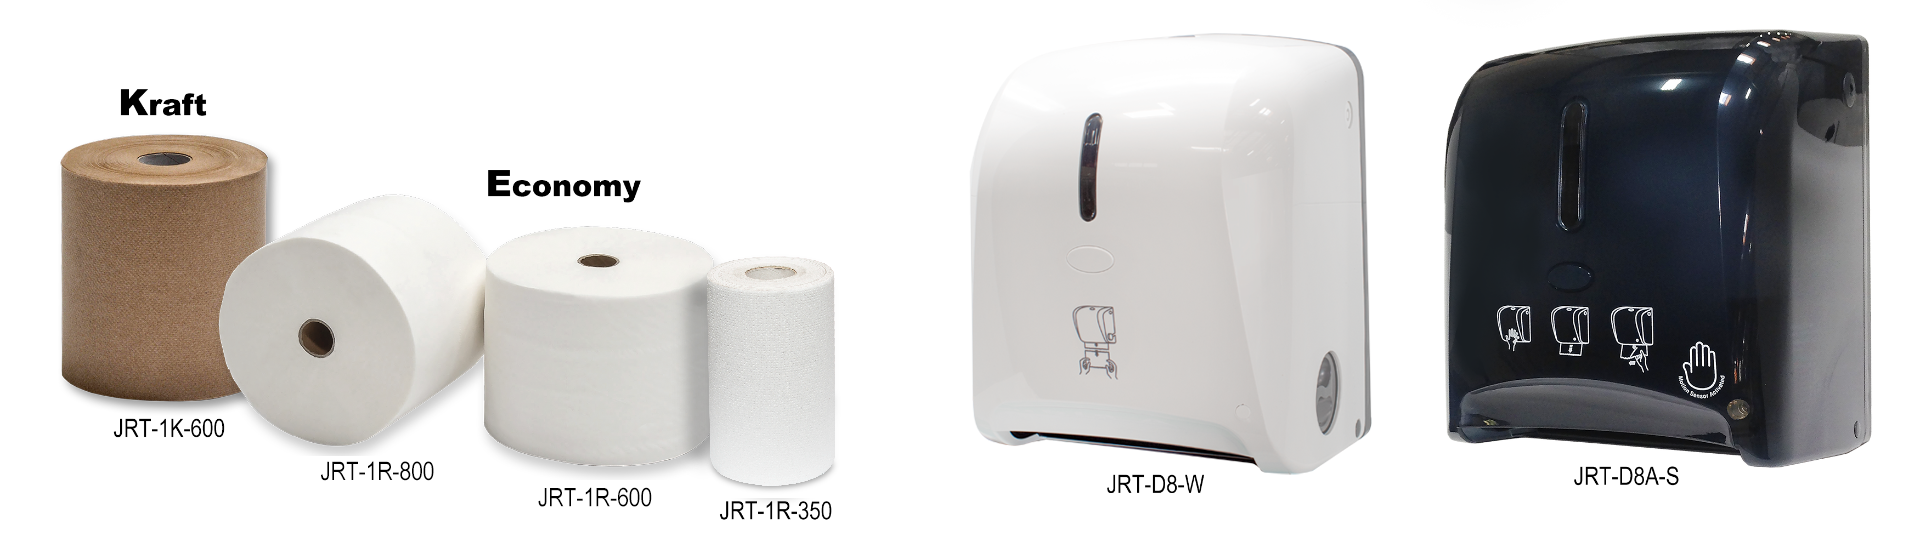 Towel Rolls & Dispensers